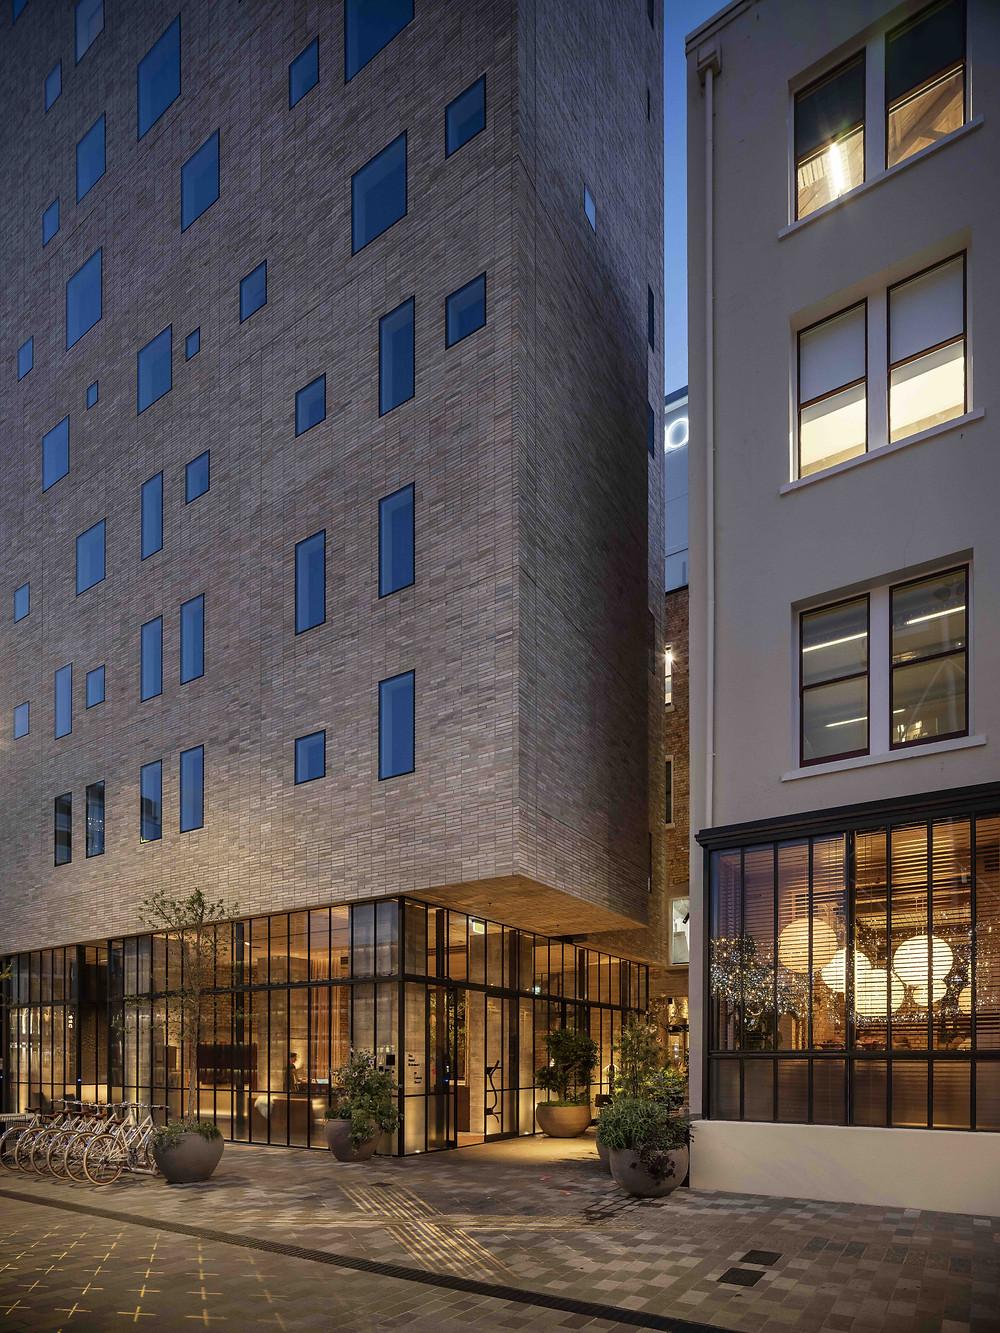 The Hotel Britomart's Brick Inlay facade is spectacular